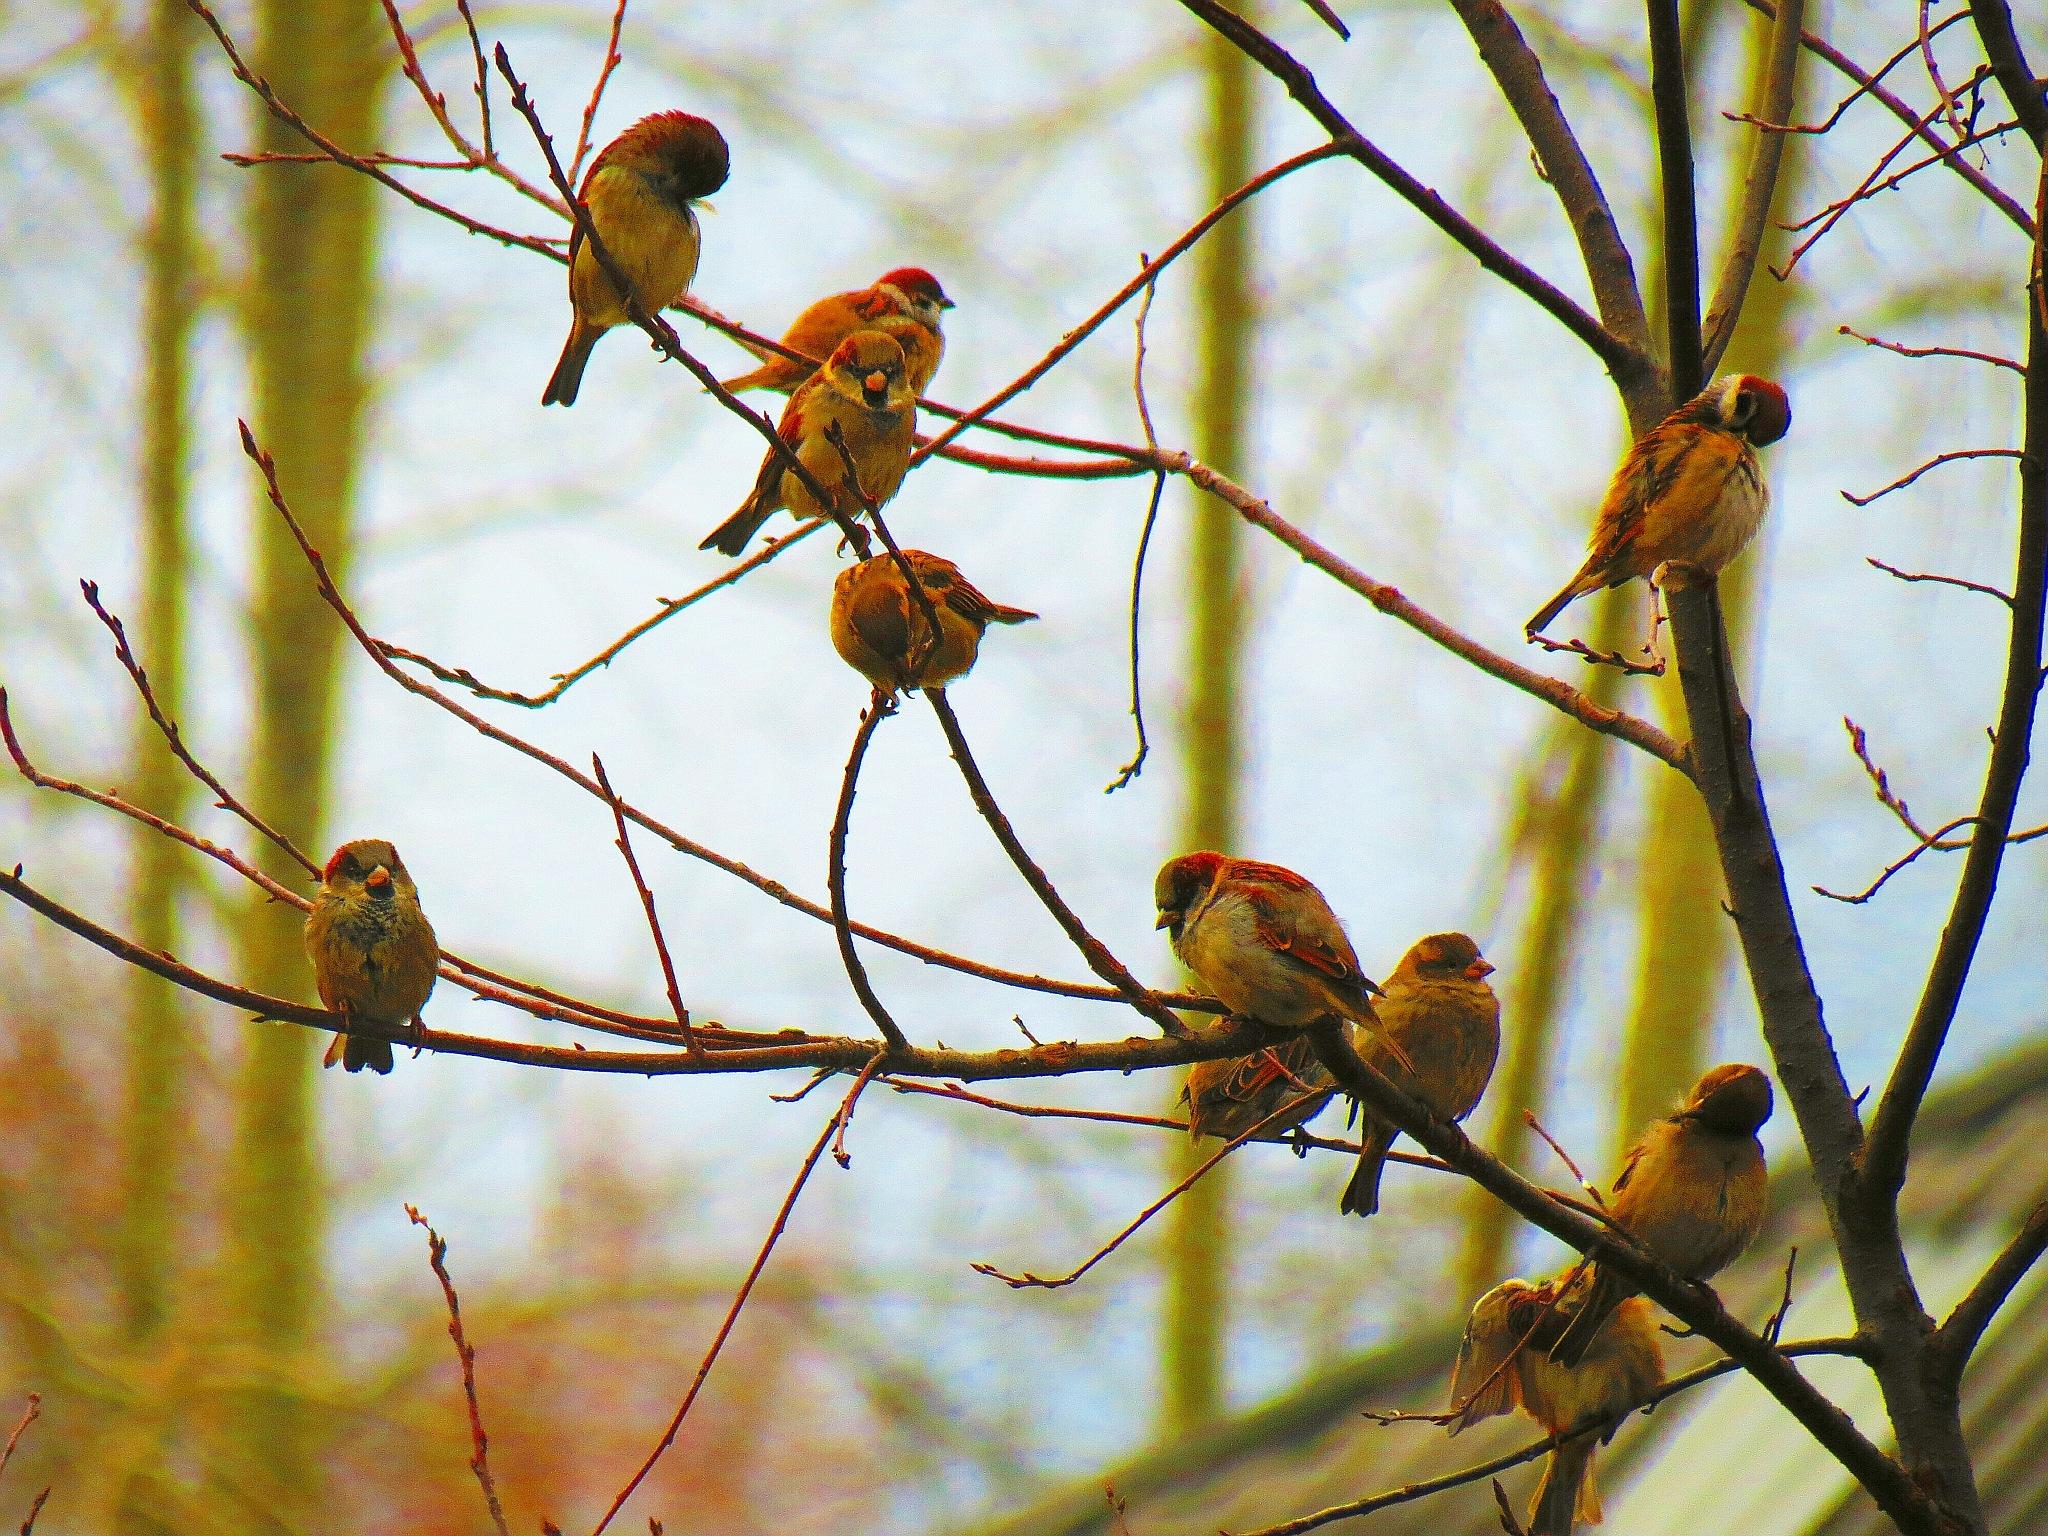 Sparrows  by sergey.parfeniuk